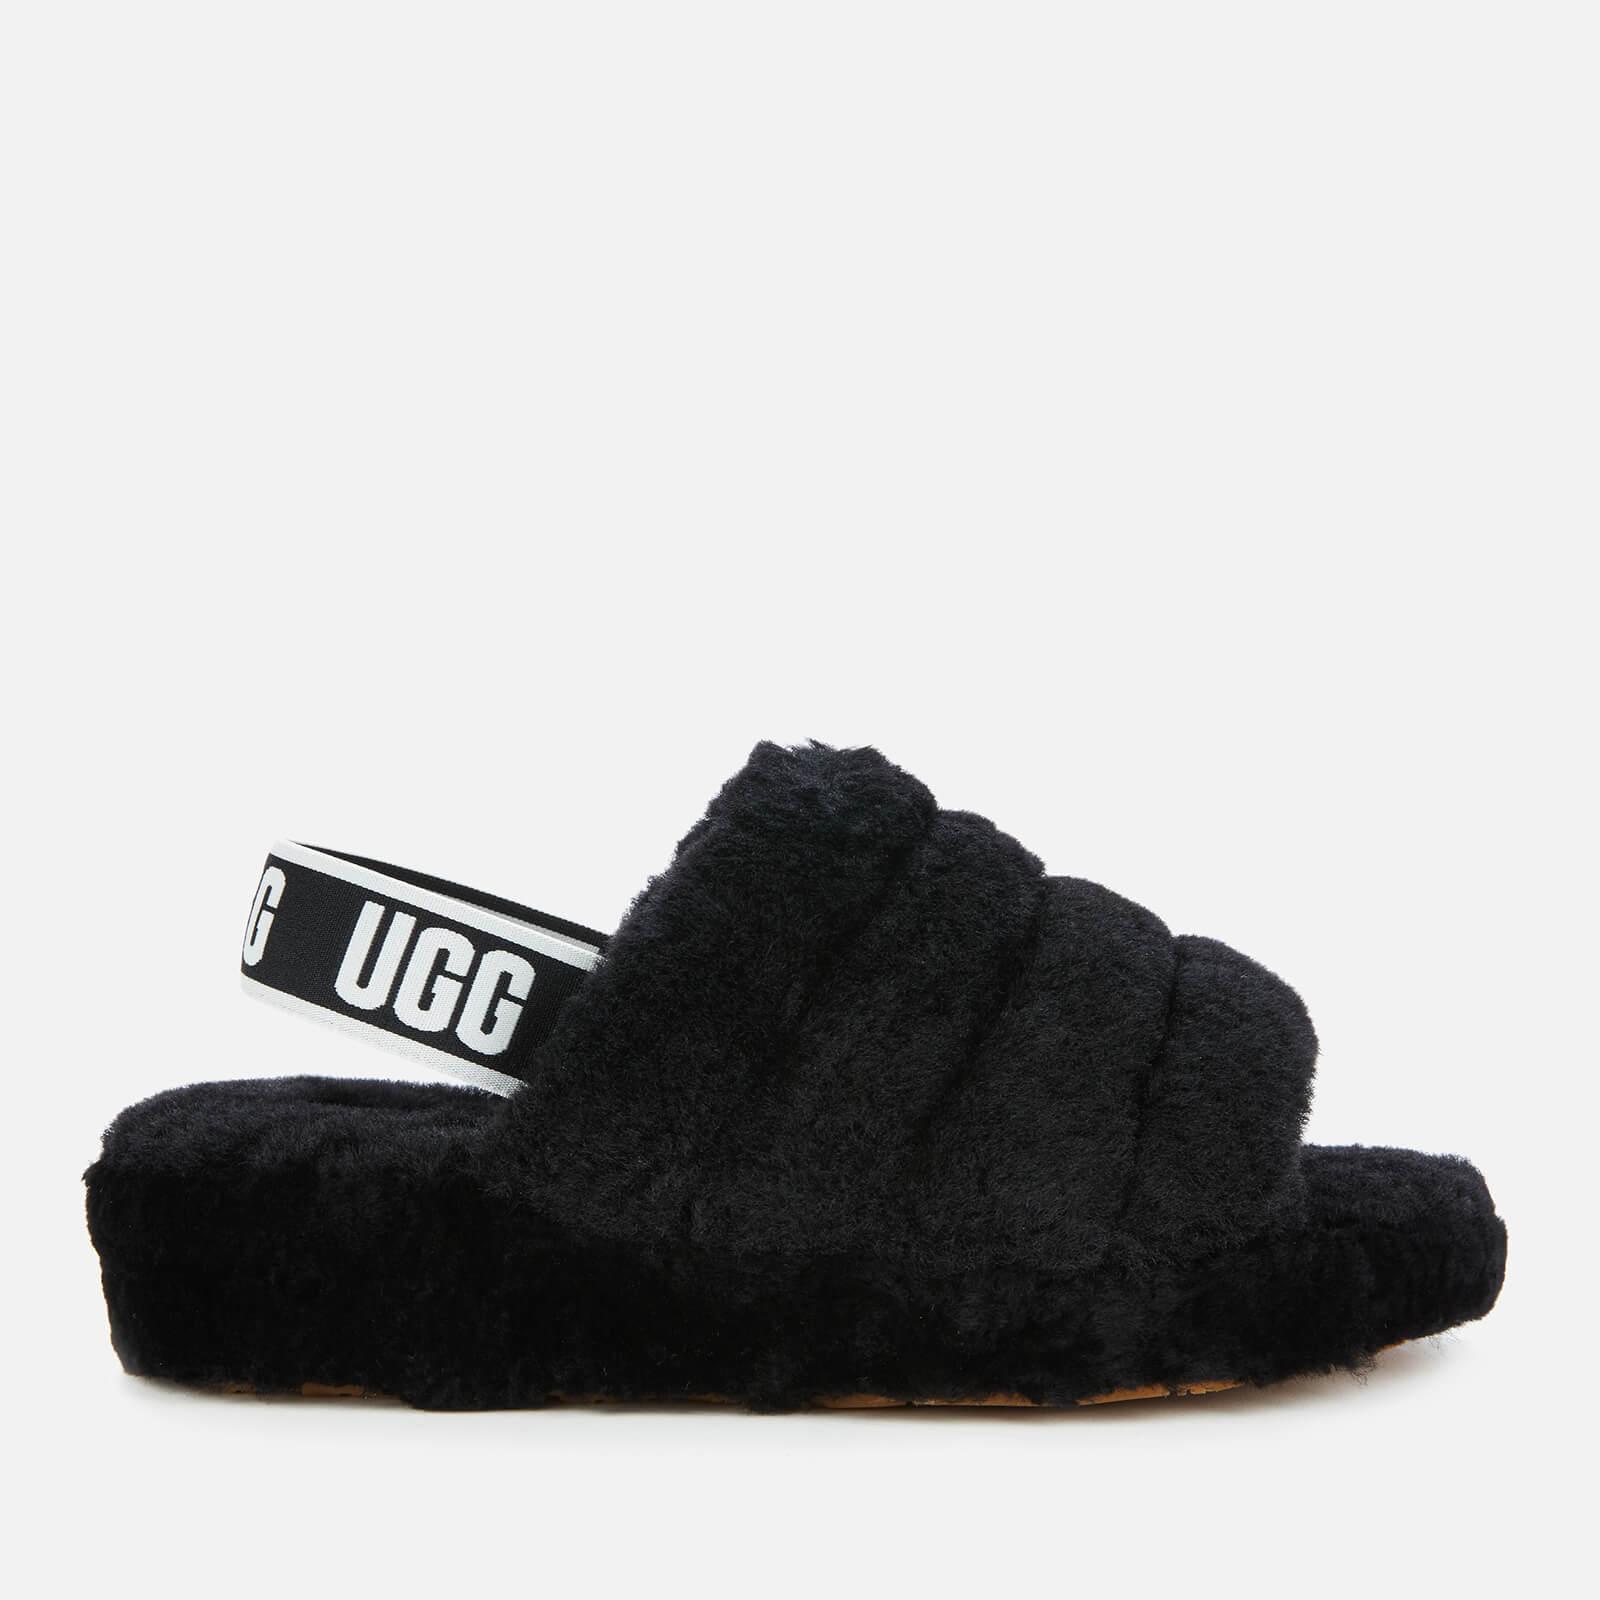 UGG Women's Fluff Yeah Slippers - Black